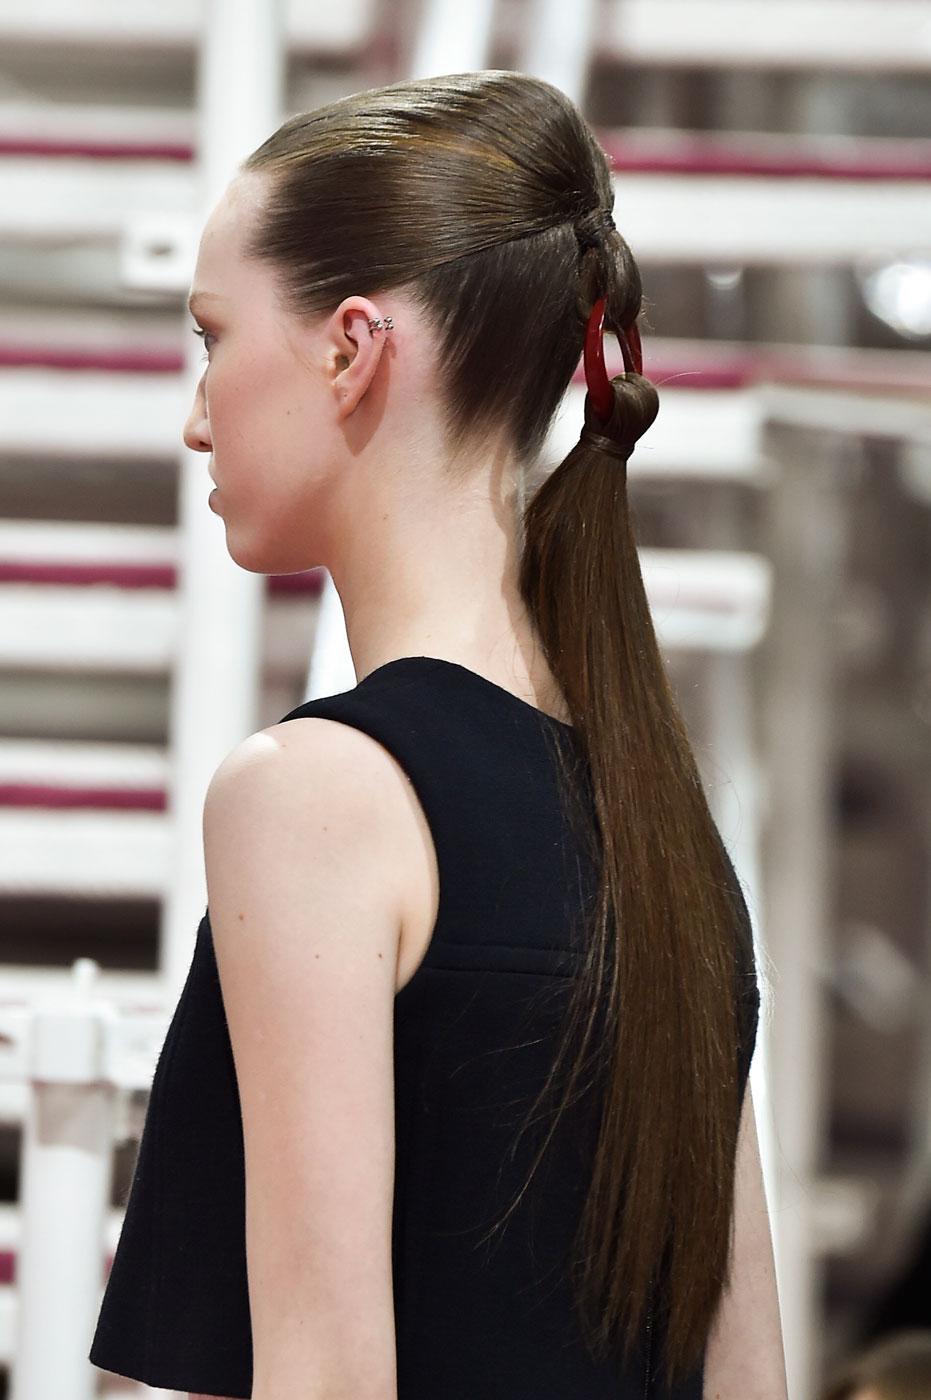 Christian-Dior-fashion-runway-show-close-ups-haute-couture-paris-spring-summer-2015-the-impression-151